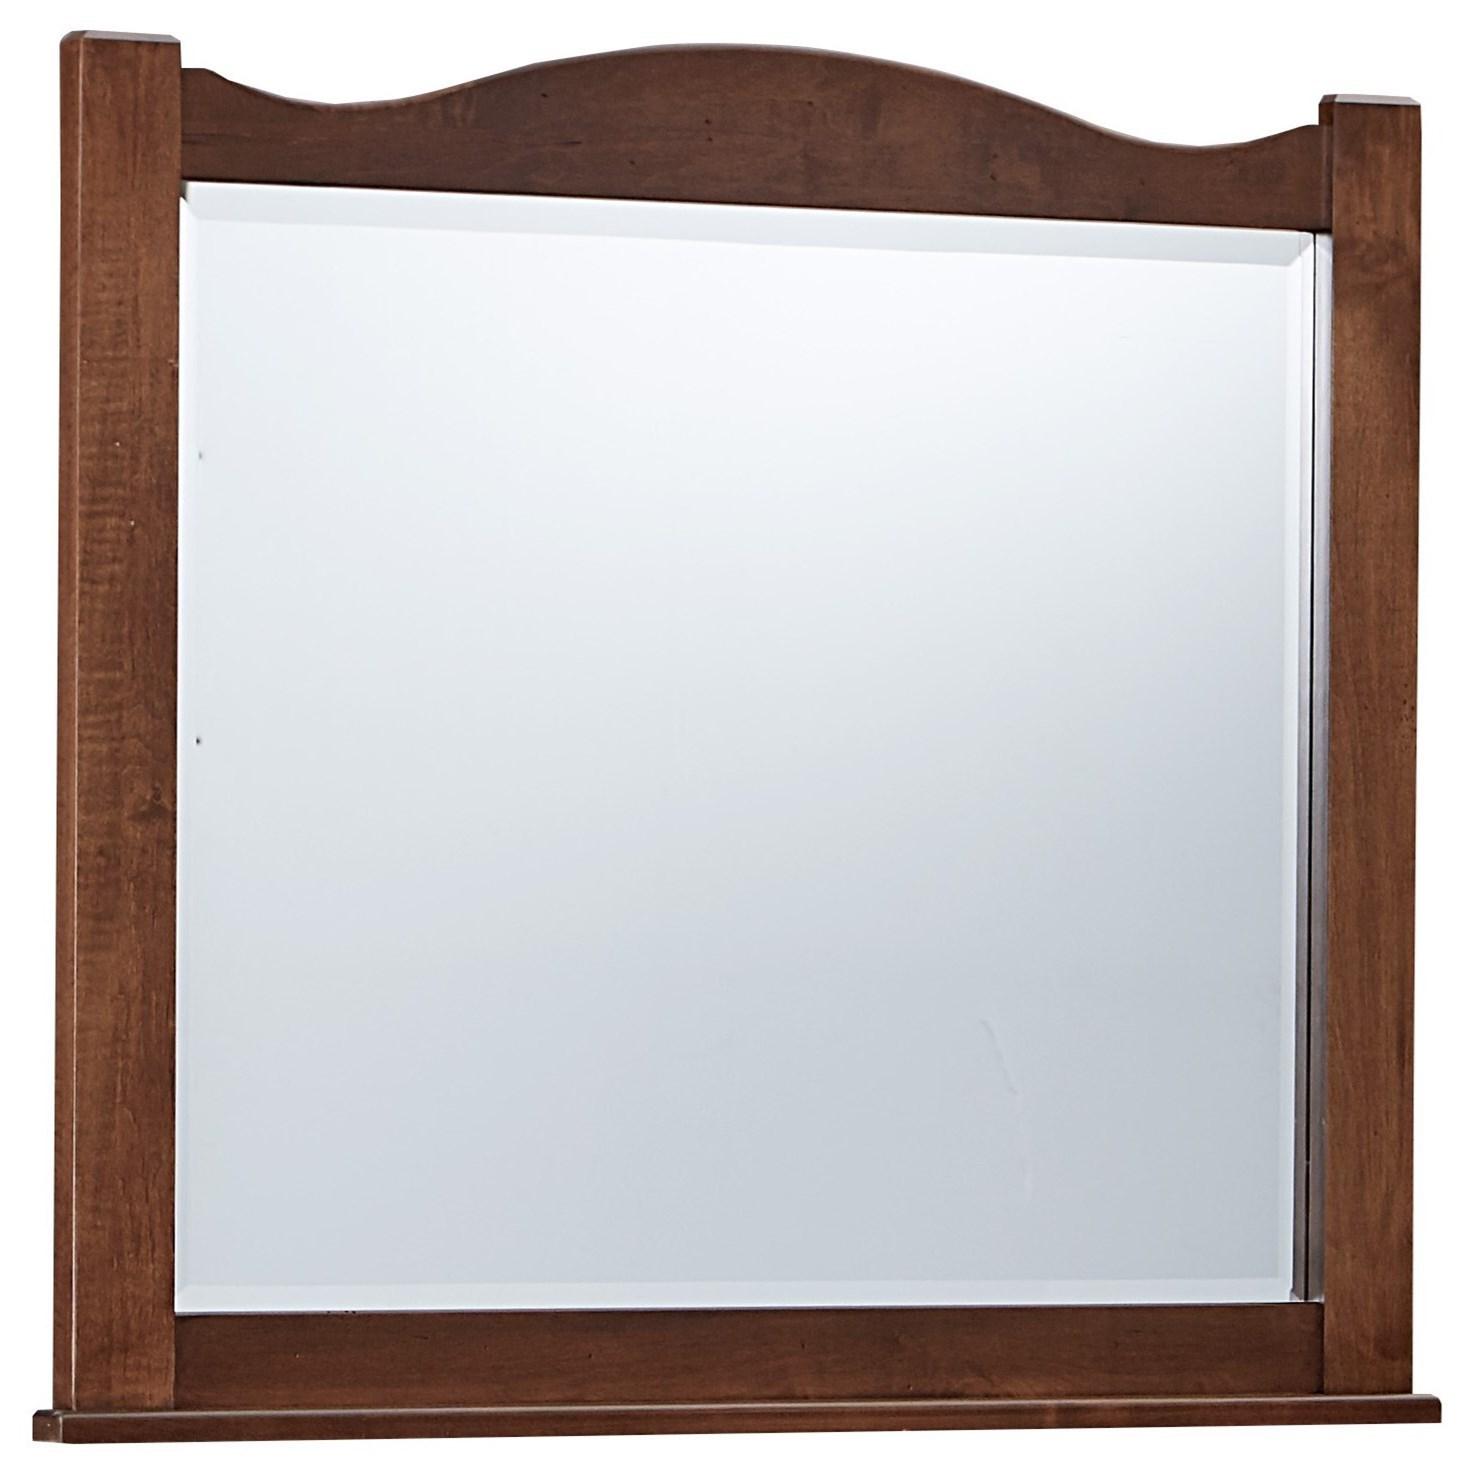 Vaughan Bassett American Maple Landscape Mirror - Beveled Glass - Item Number: 400-446